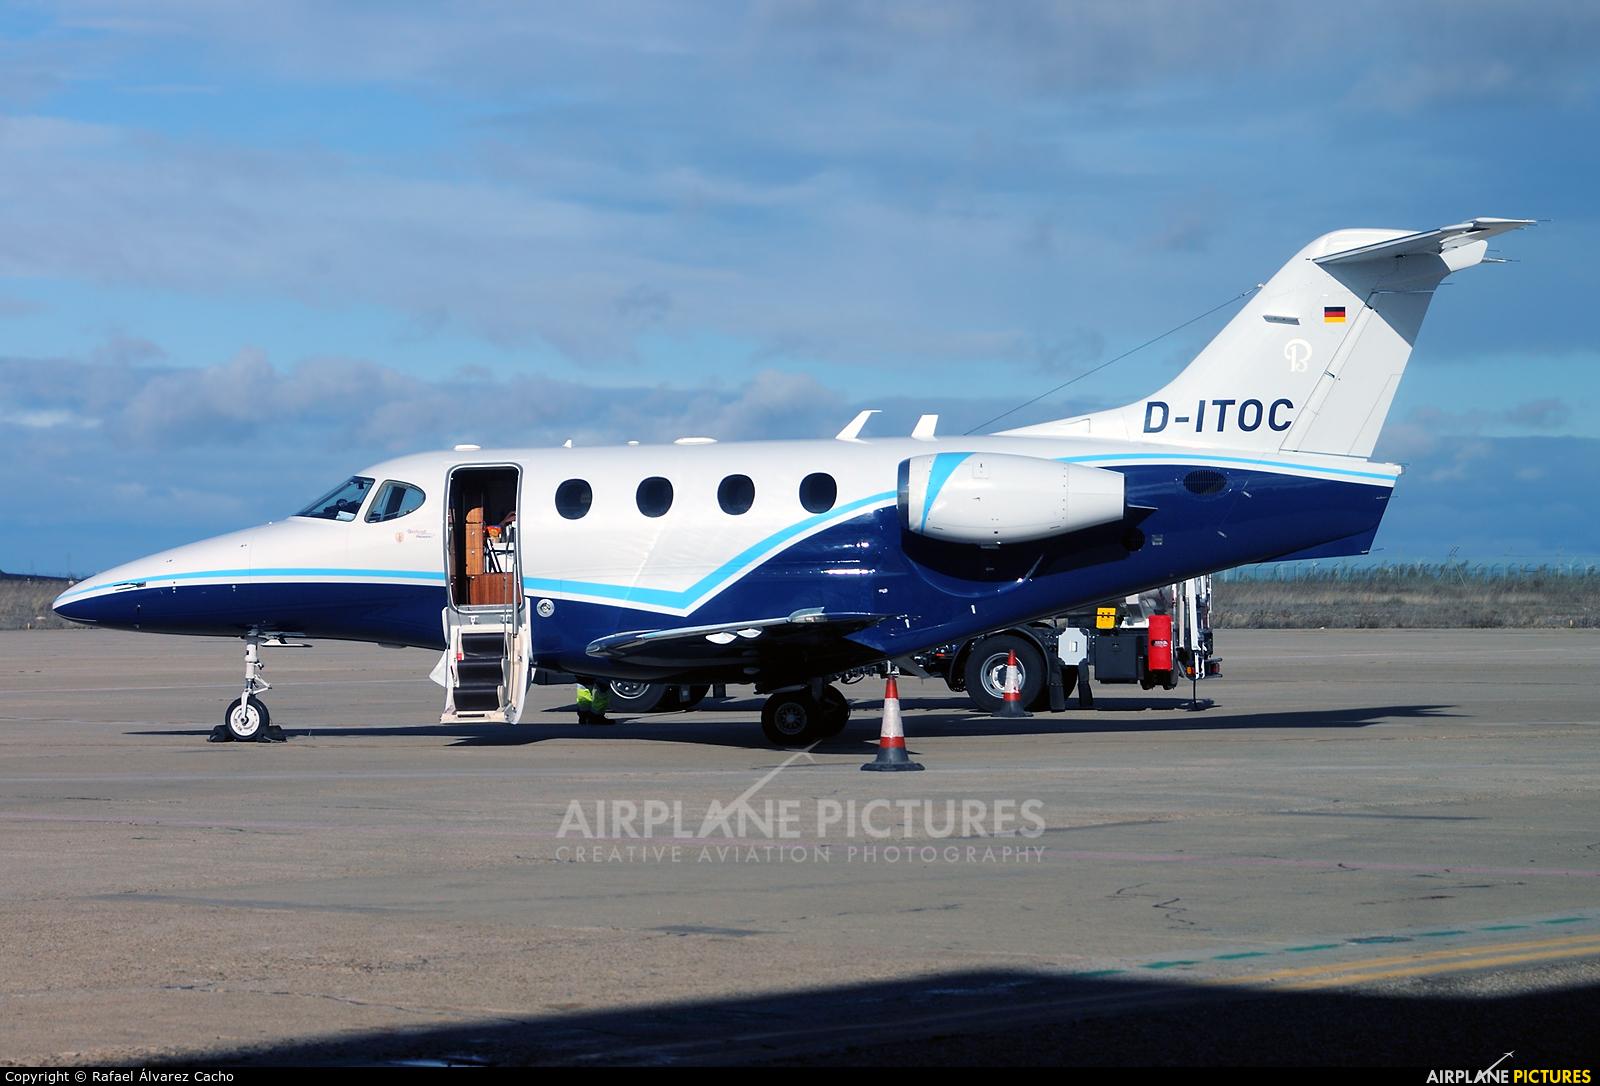 Exxaero D-ITOC aircraft at Valladolid - Villanubla